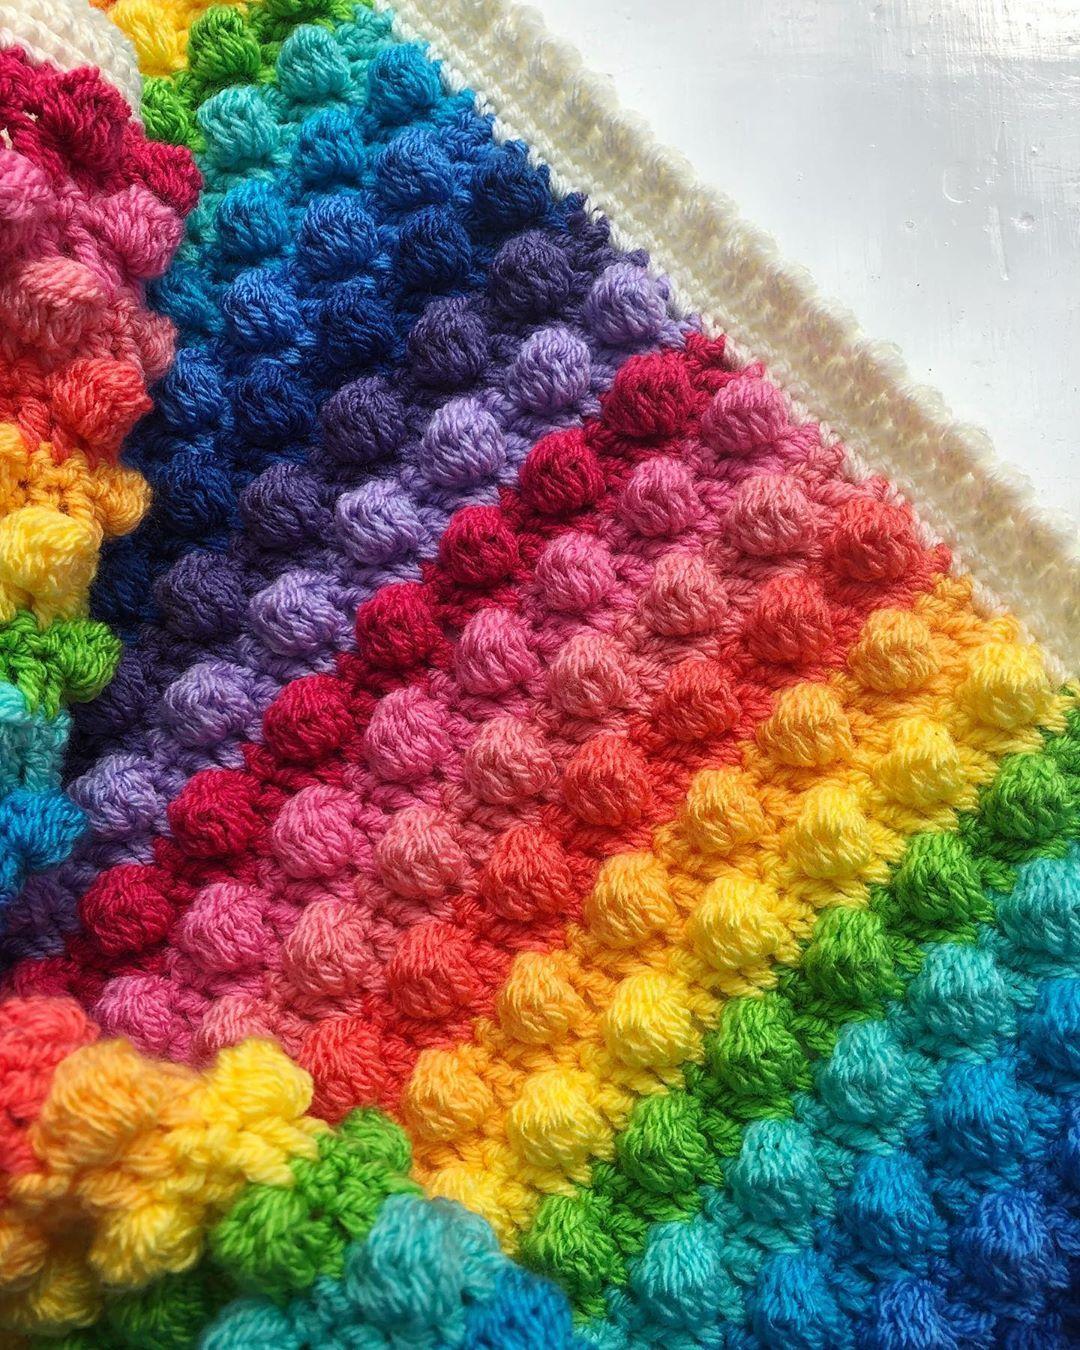 Today S Job Yarn Stylecraftyarns Dk Pattern Mooglyblog Blackberry Salad Blanket Edging Attic24 Bobble Shell Blanket Pattern Yarn